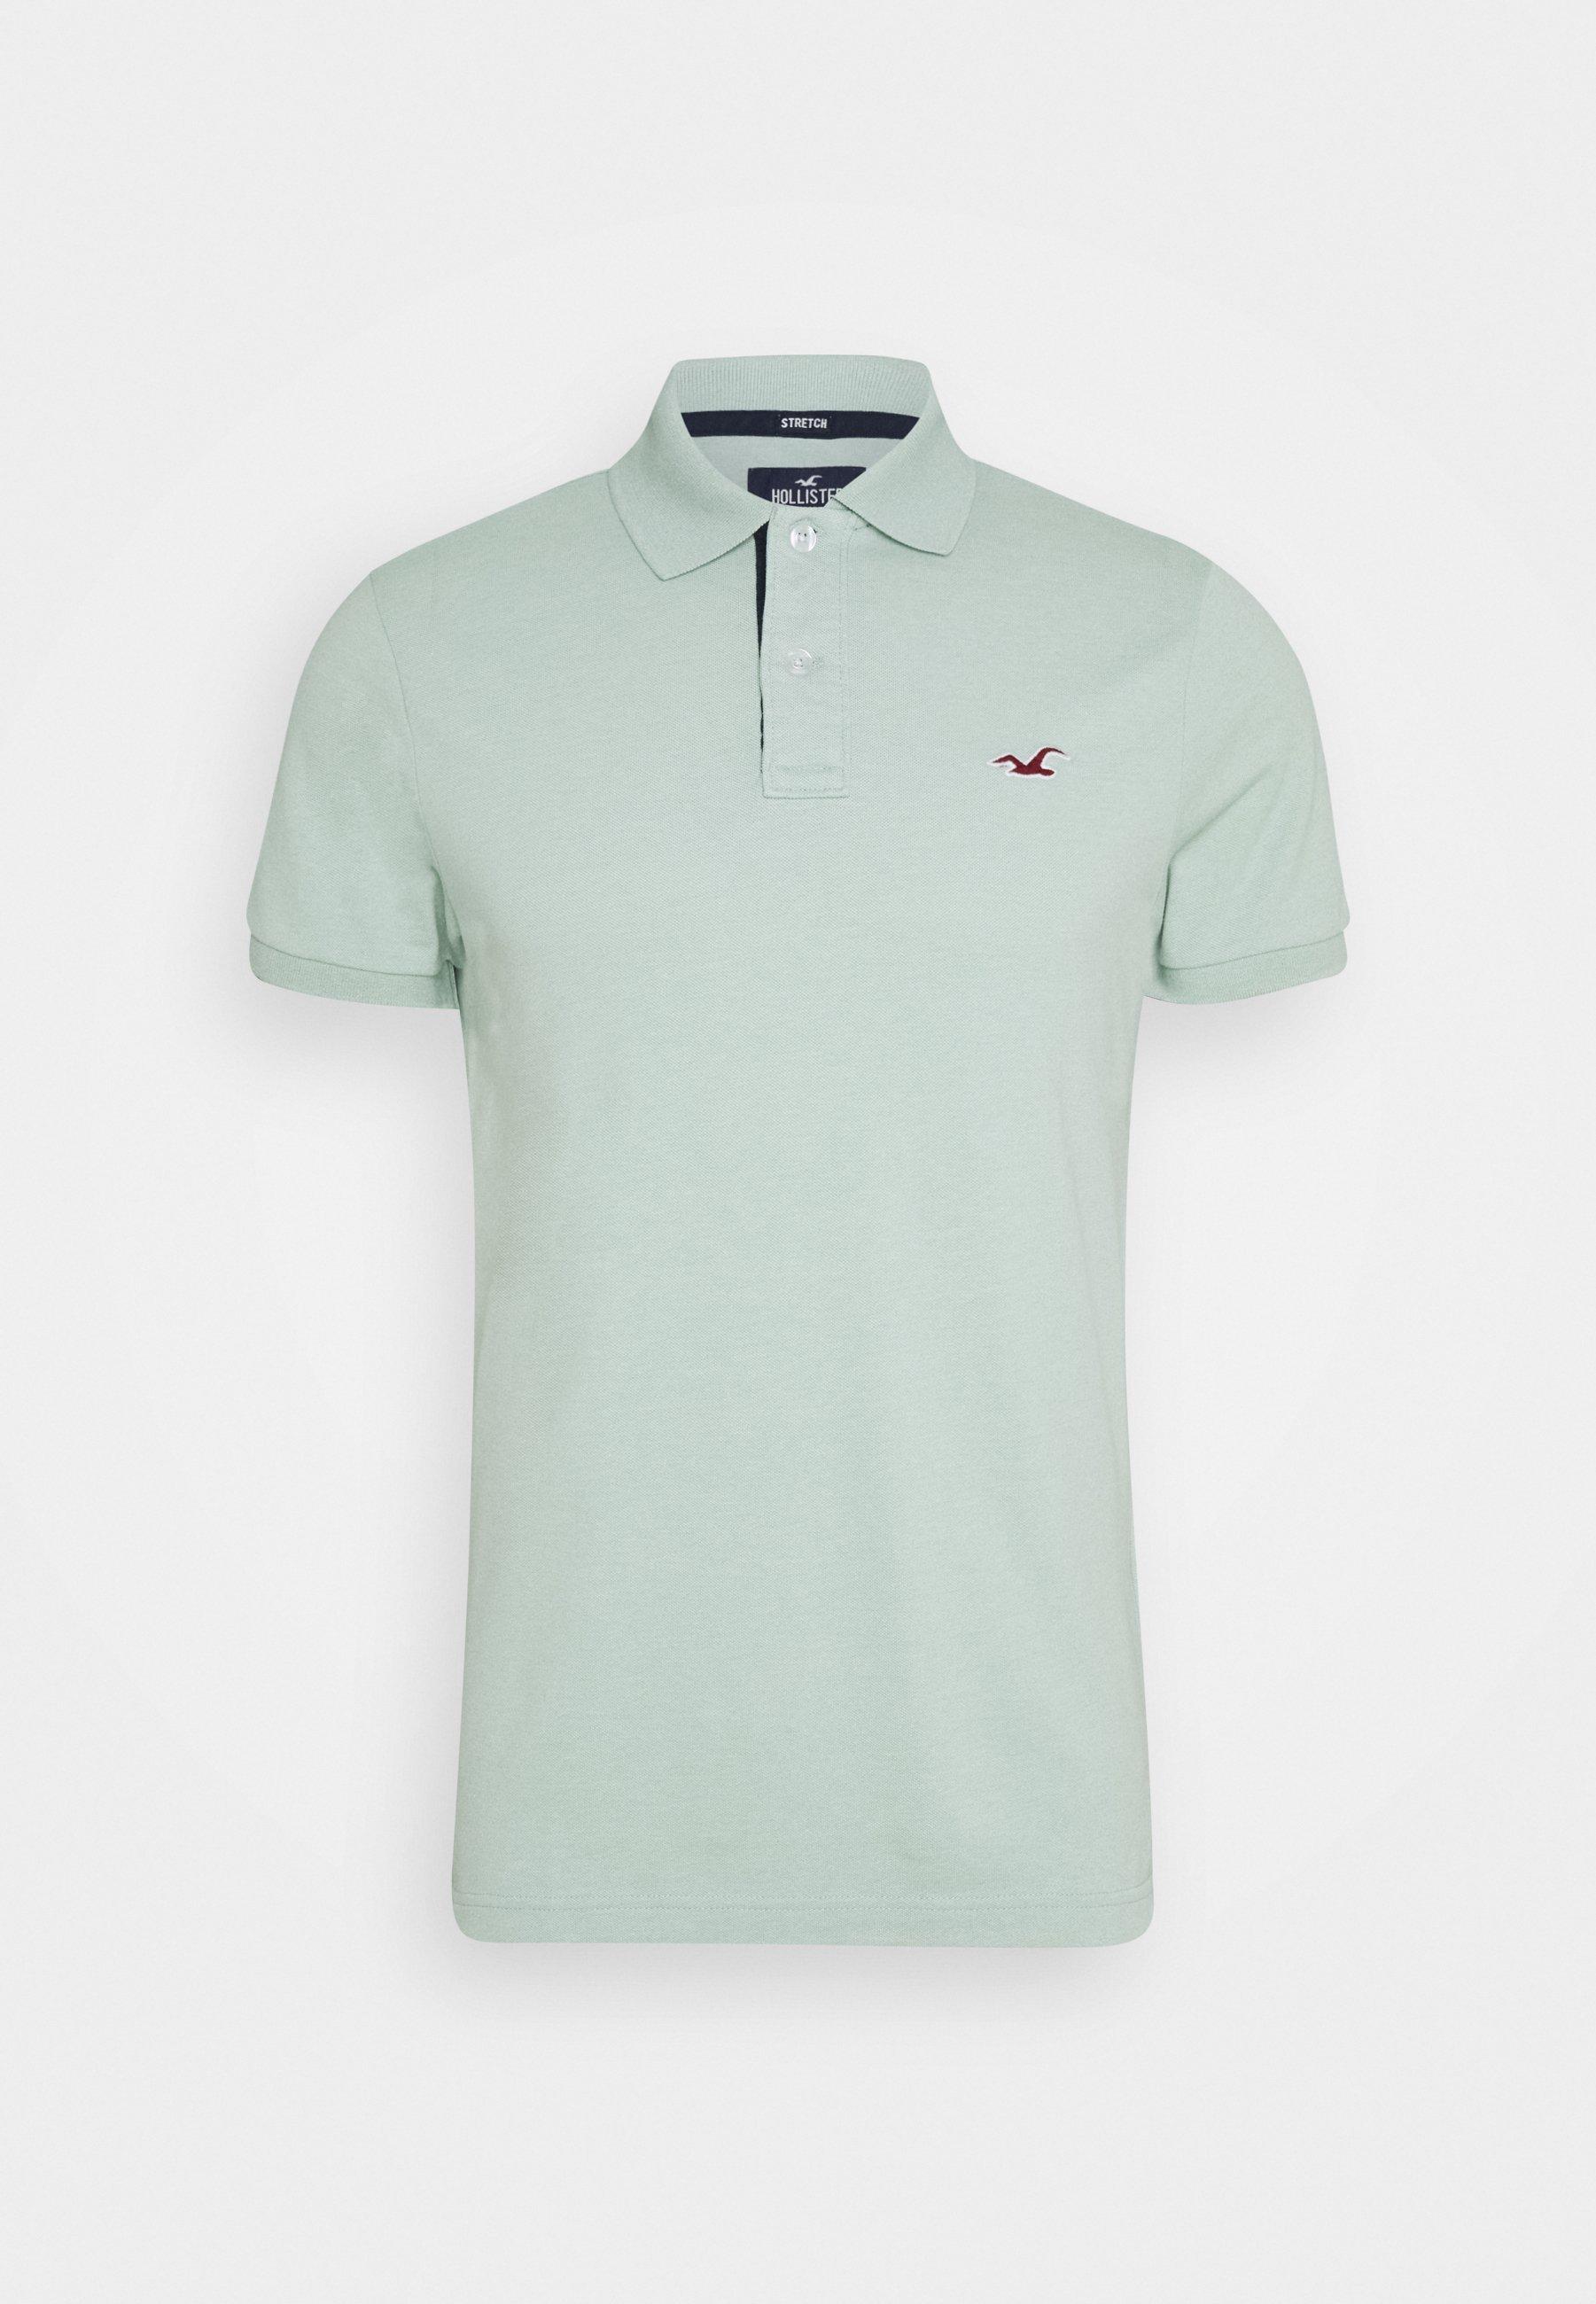 Hollister Co. Poloshirt - Burgundy